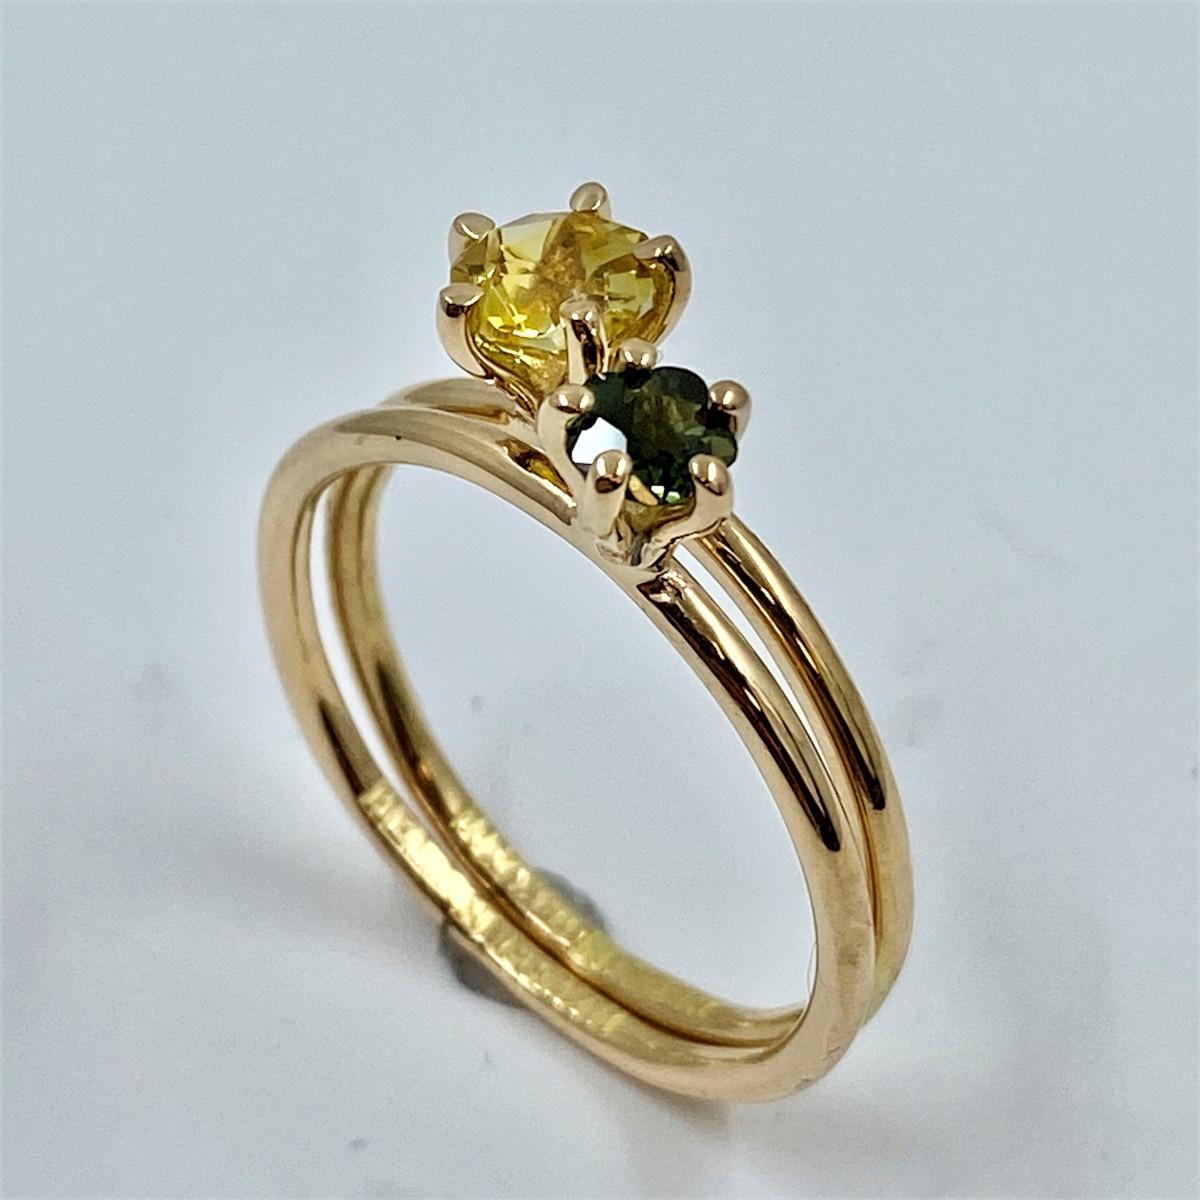 Safirring, stenring, gul ring, enstensring